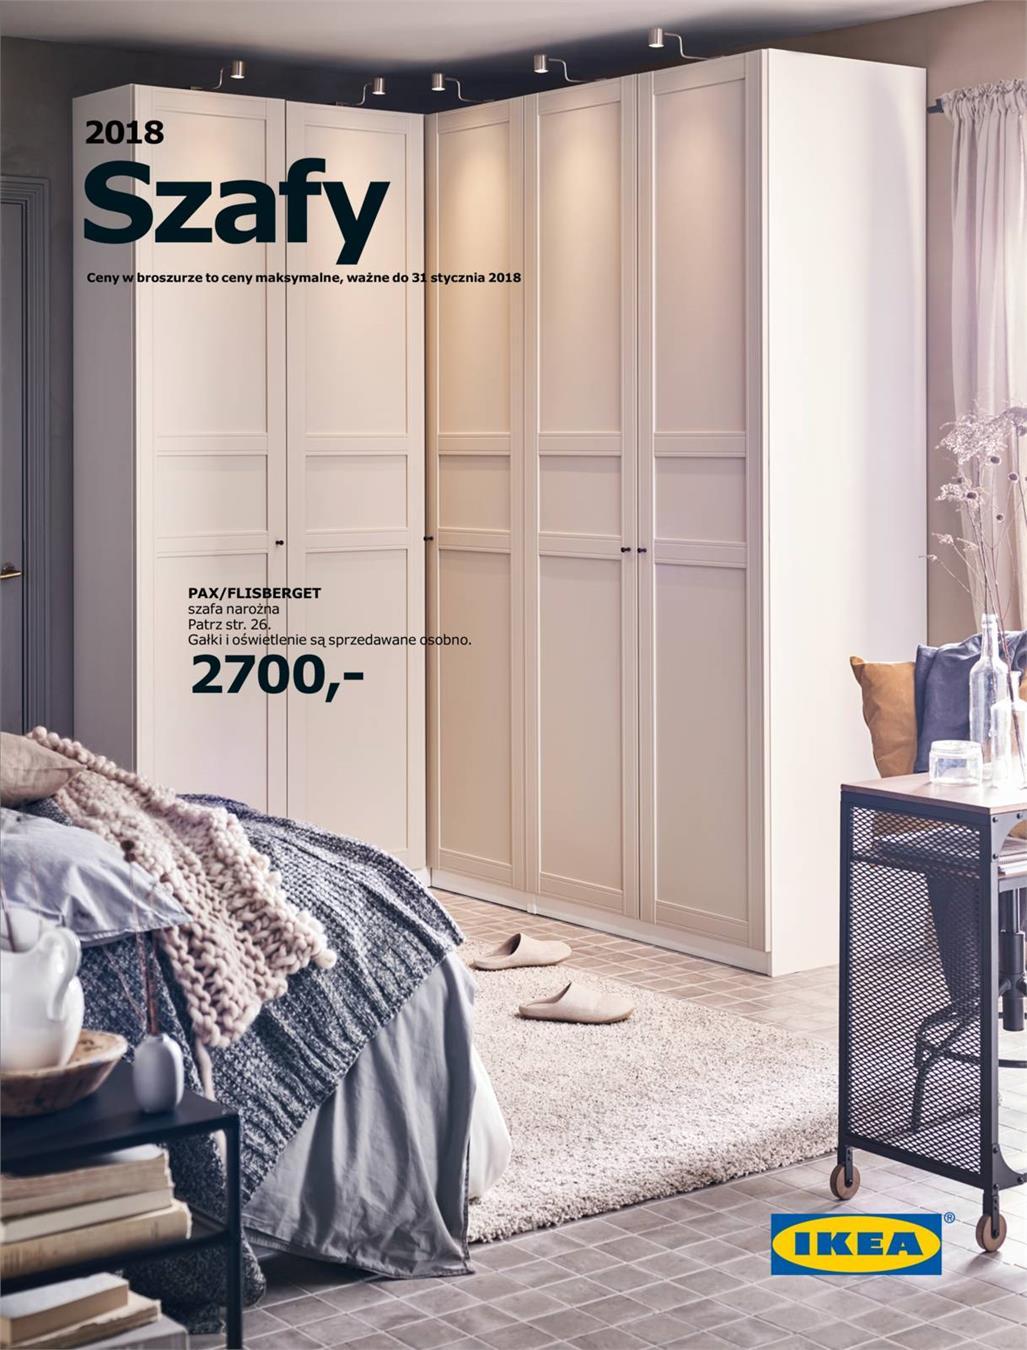 Gazetka Promocyjna Ikeacom Pl Katalog Szafy 2018